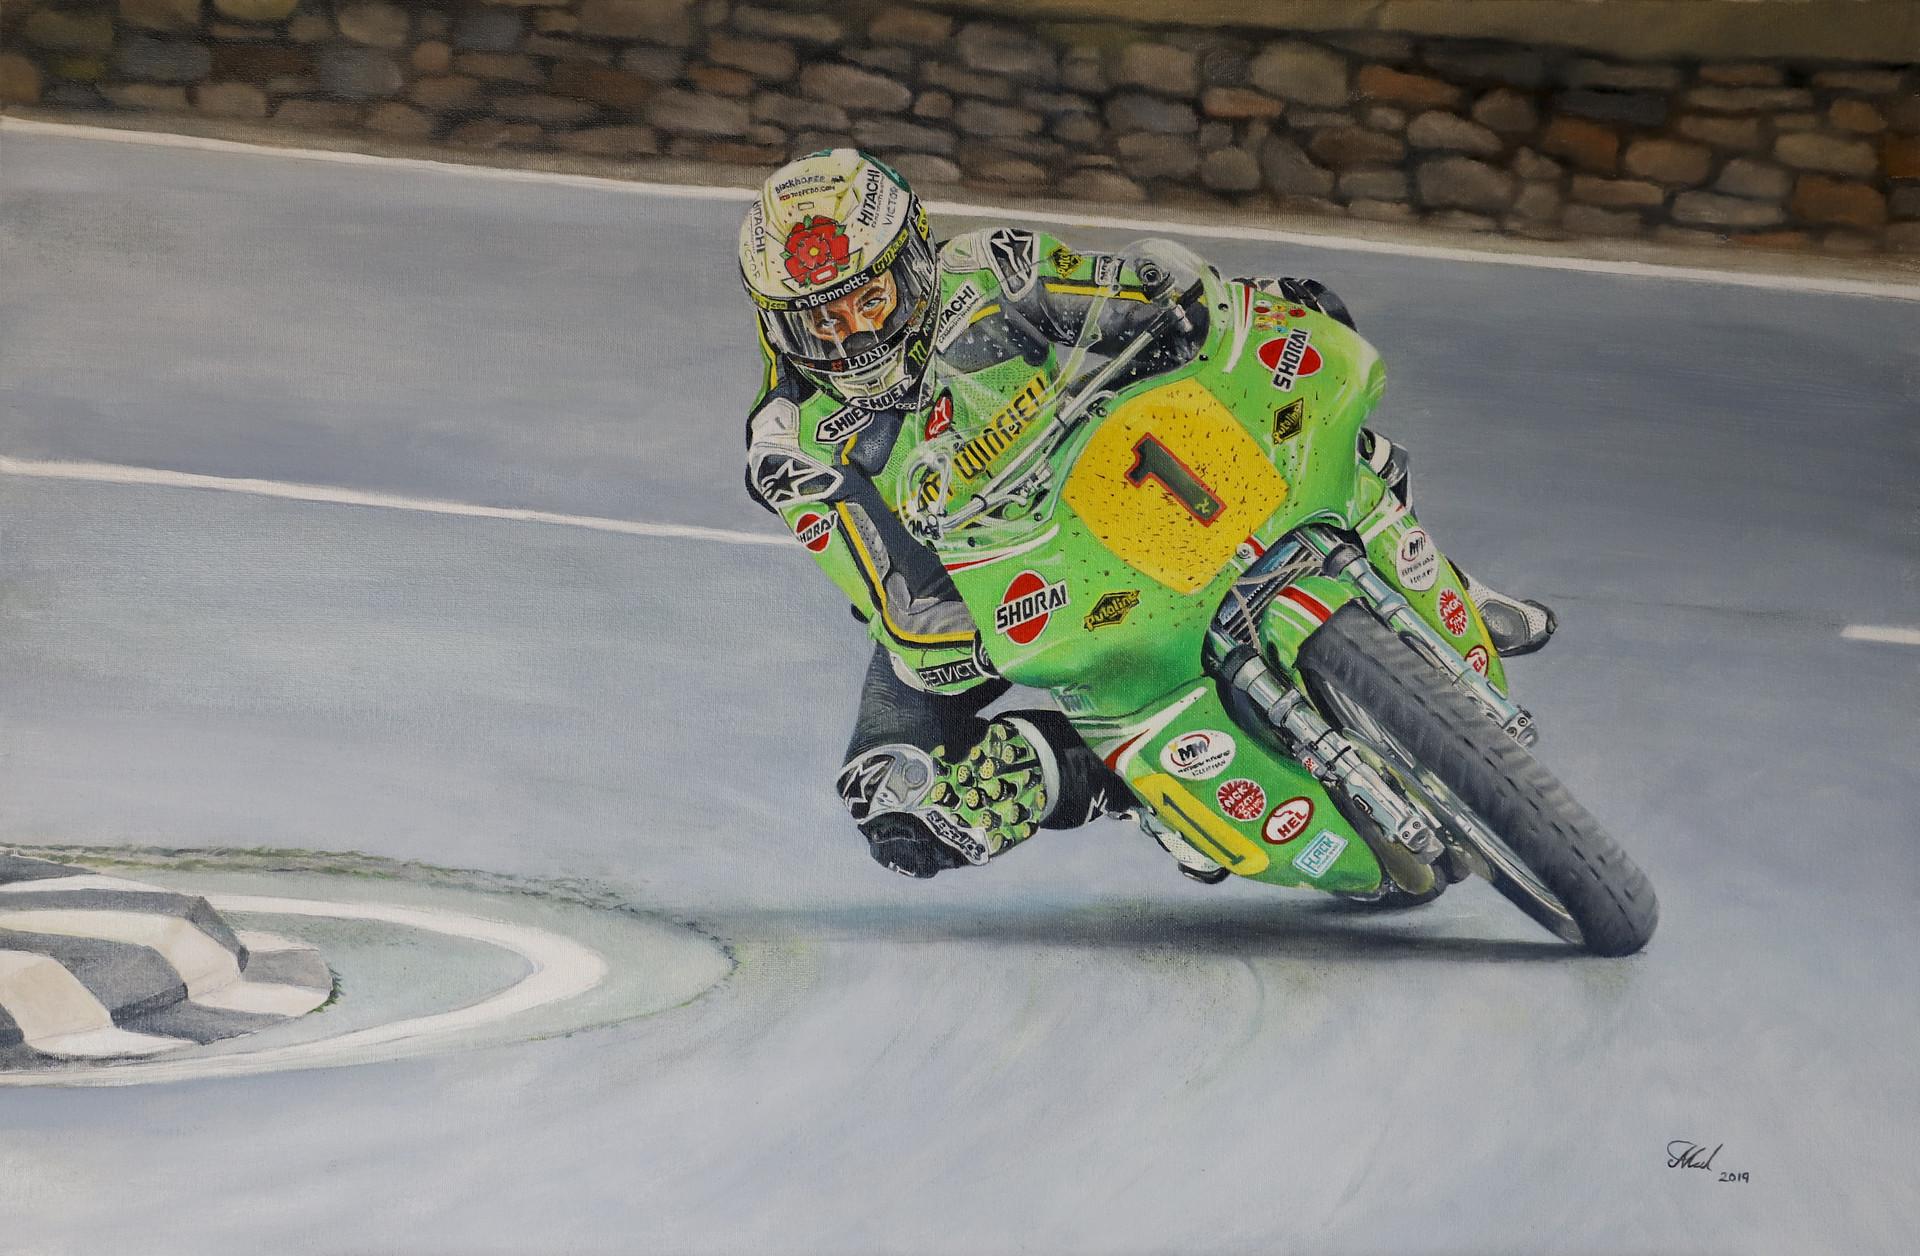 John McGuinness riding the Winield Paton